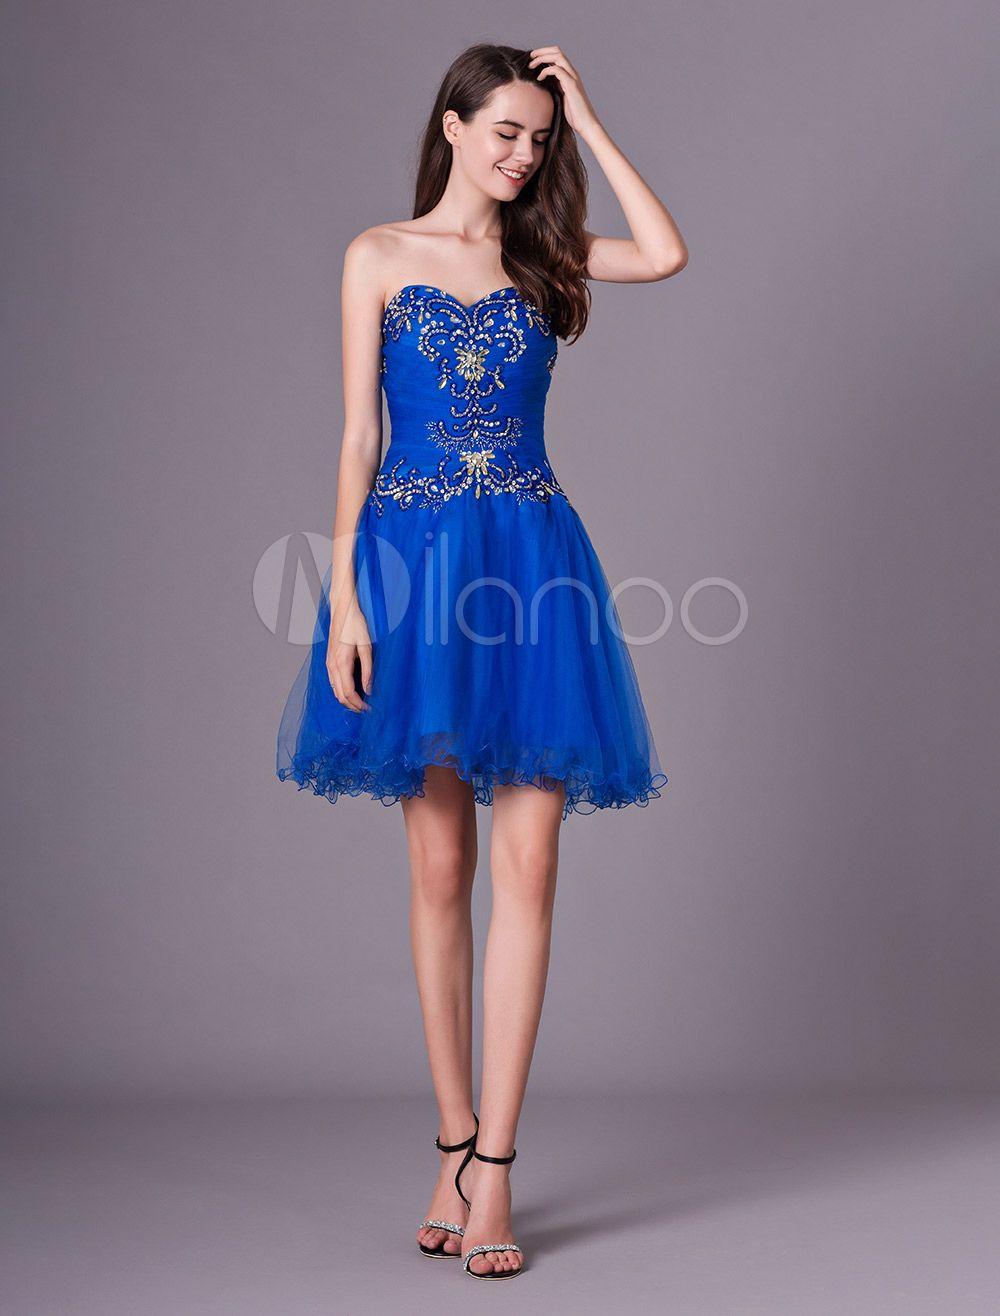 Short Prom Dresses Royal Blue Strapless Tulle Beaded Graduation